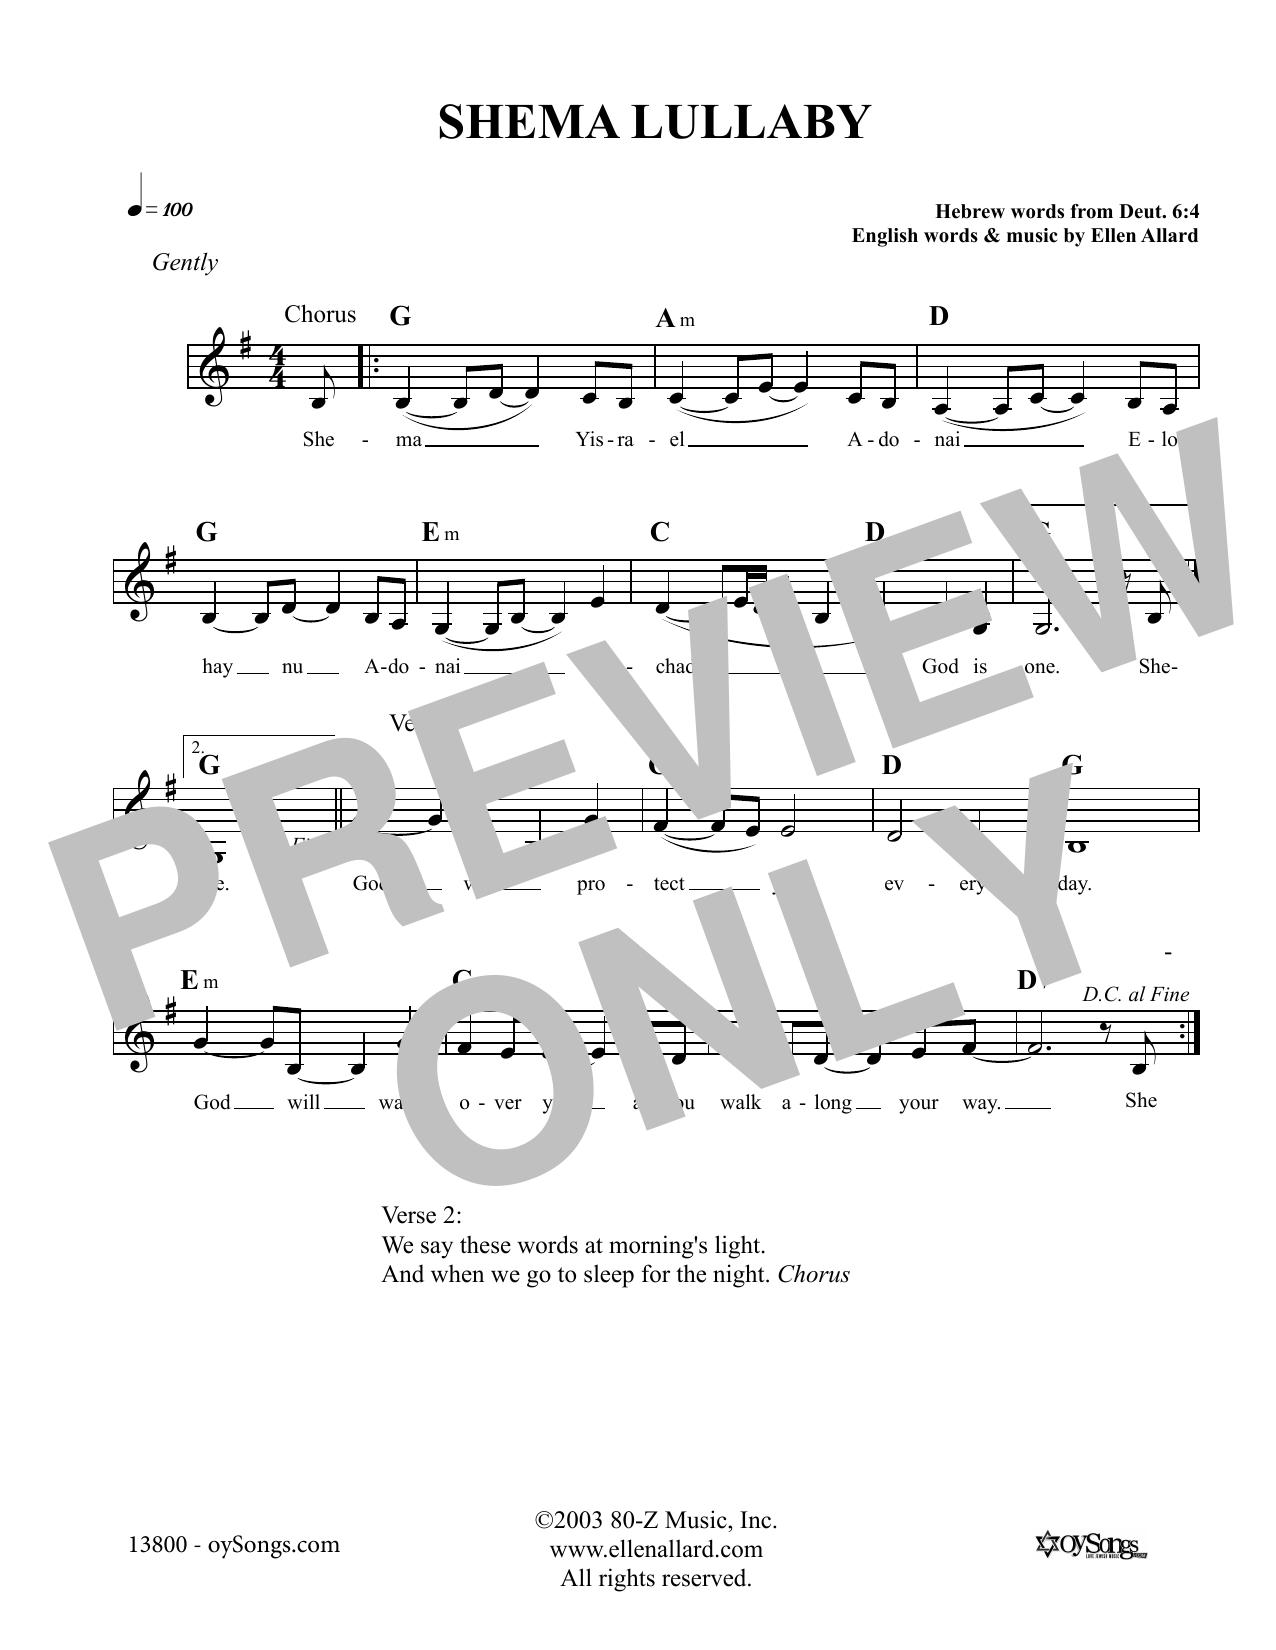 Shema Lullaby (Melody Line, Lyrics & Chords)